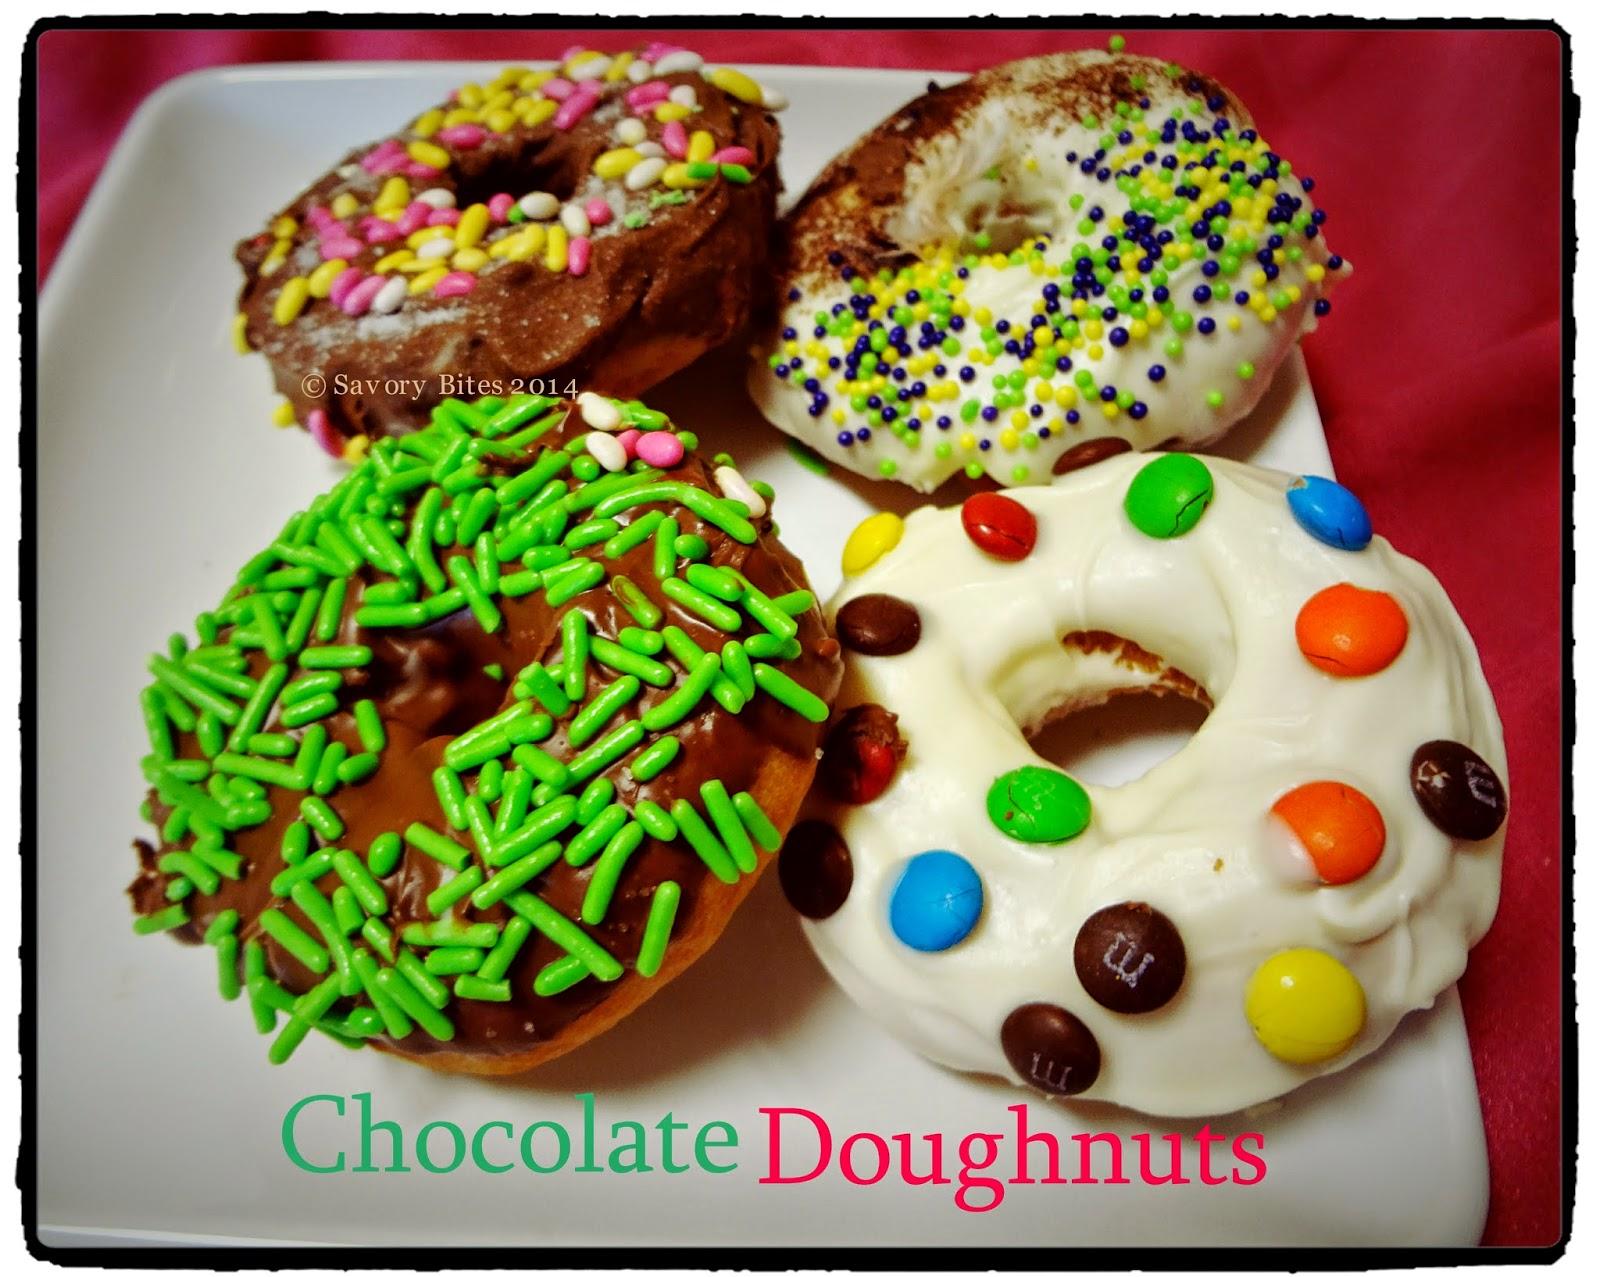 Chocolate Glazed Doughnuts